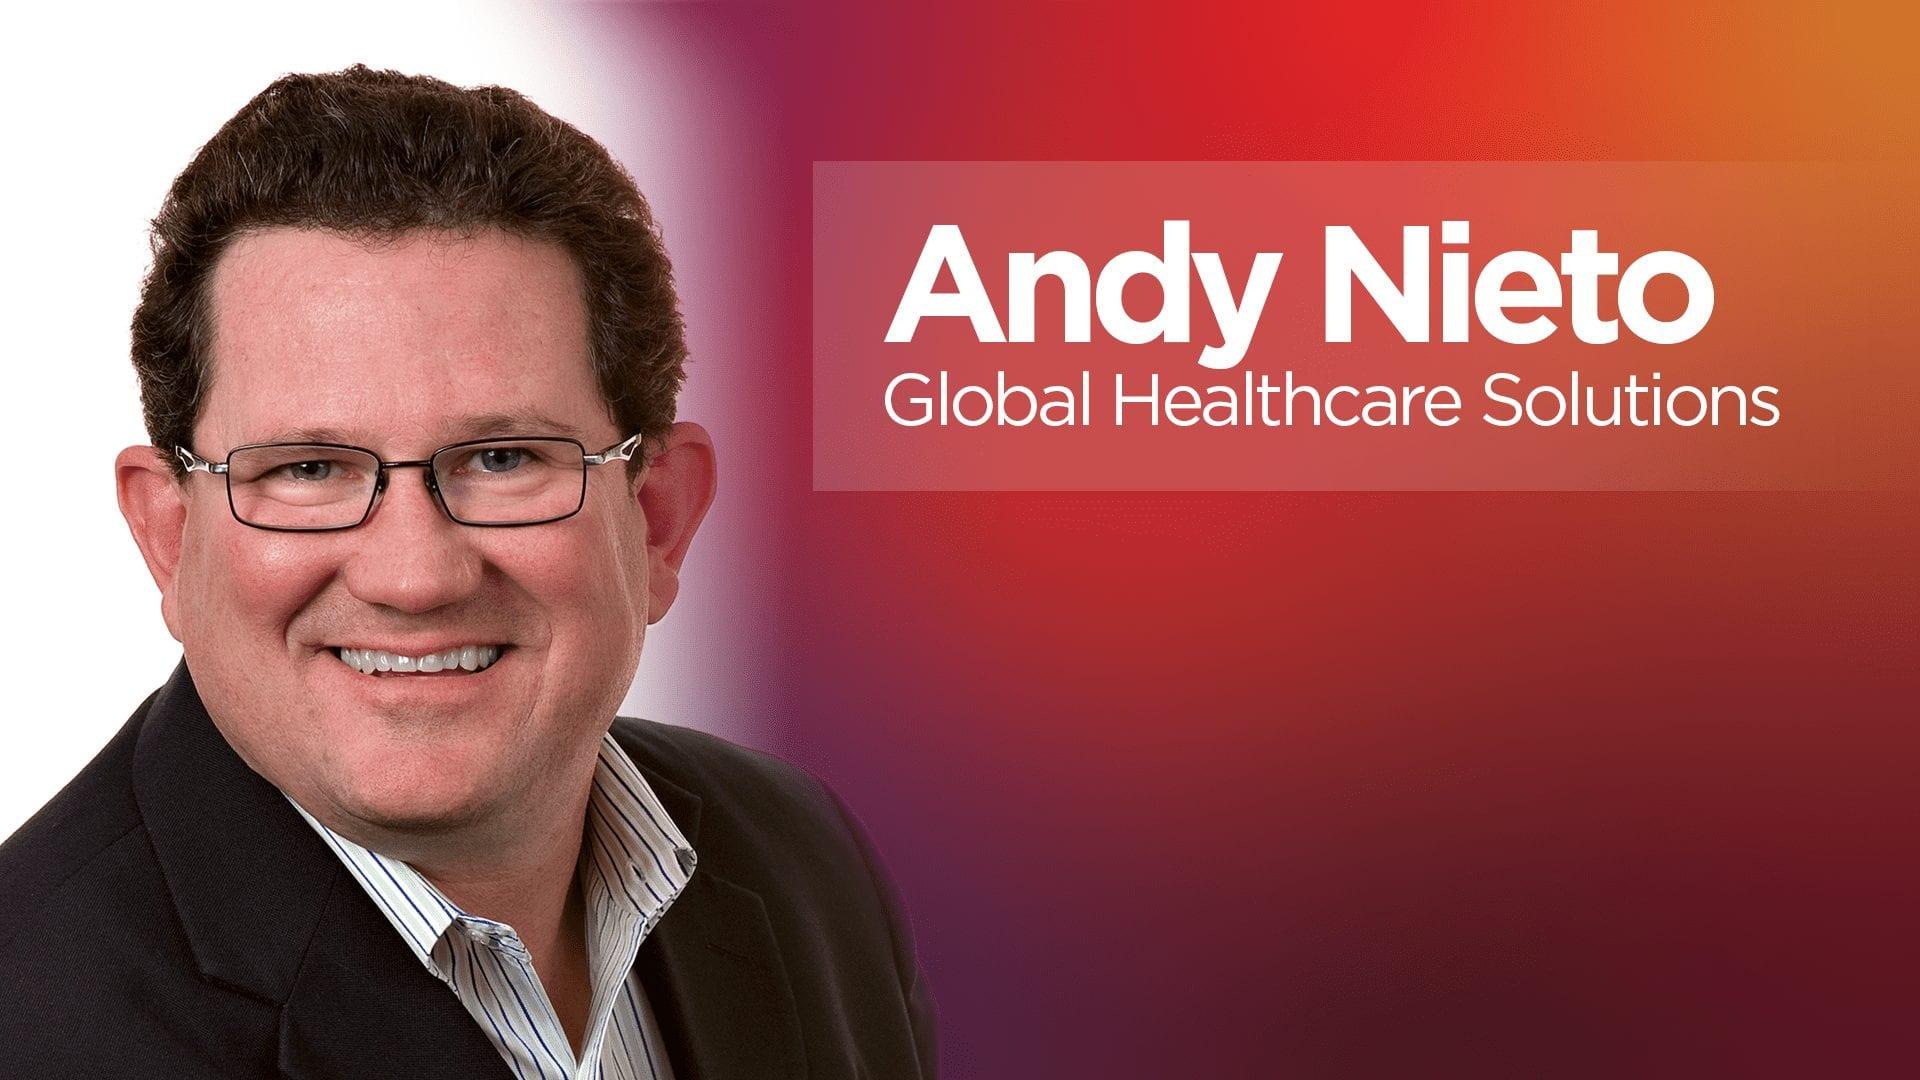 Andy Nieto